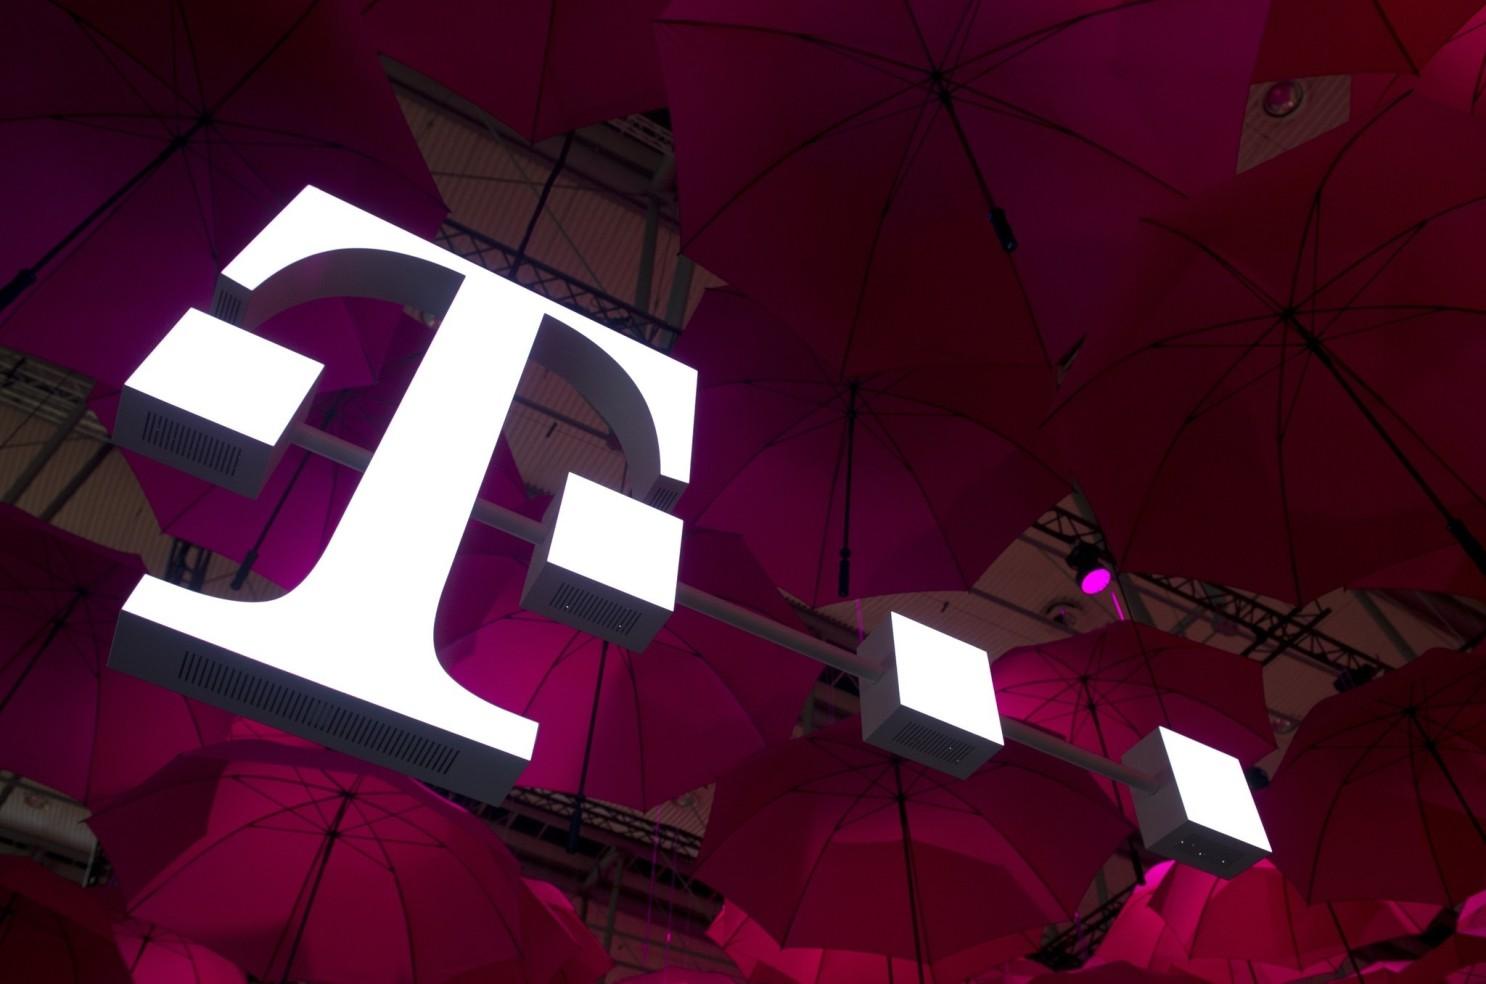 a-t-mobile-confirma-violacao-de-dados-de-86-milhoes-de-clientes